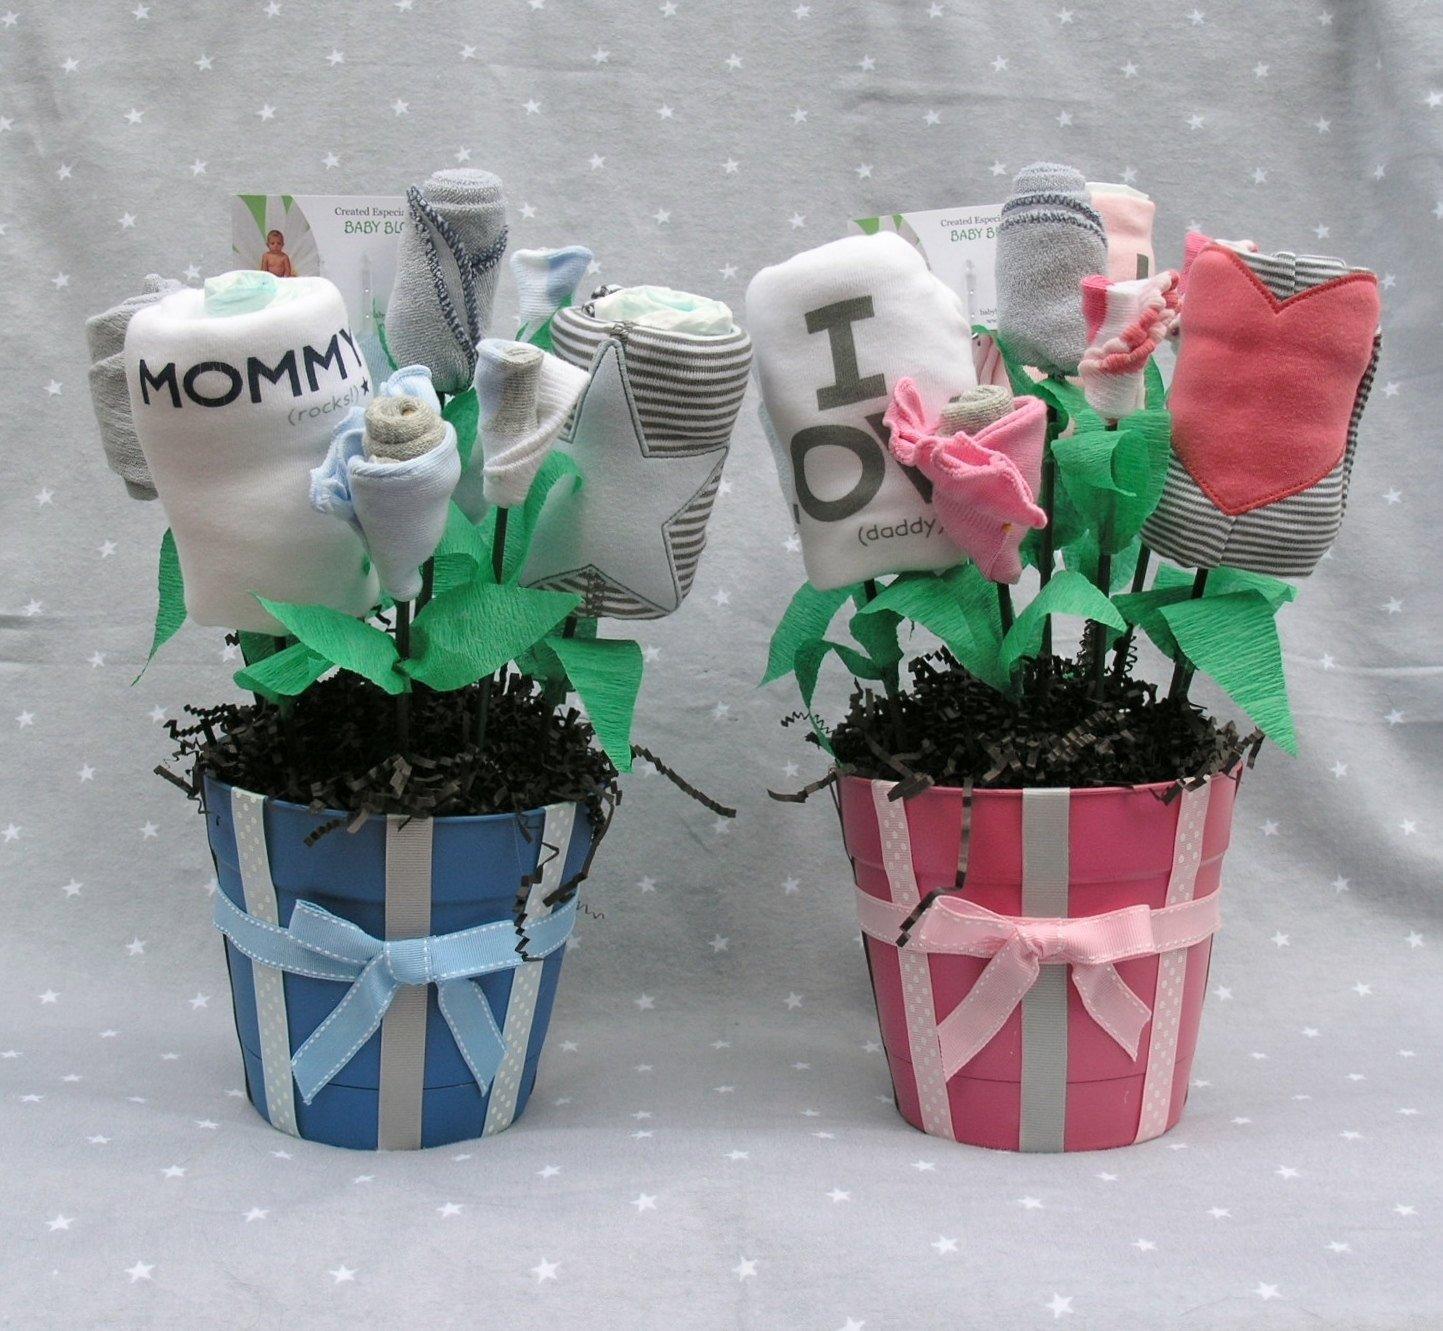 10 Wonderful Unique Baby Shower Gift Ideas unique baby shower gift ideas for girl baby shower ideas gallery 2021